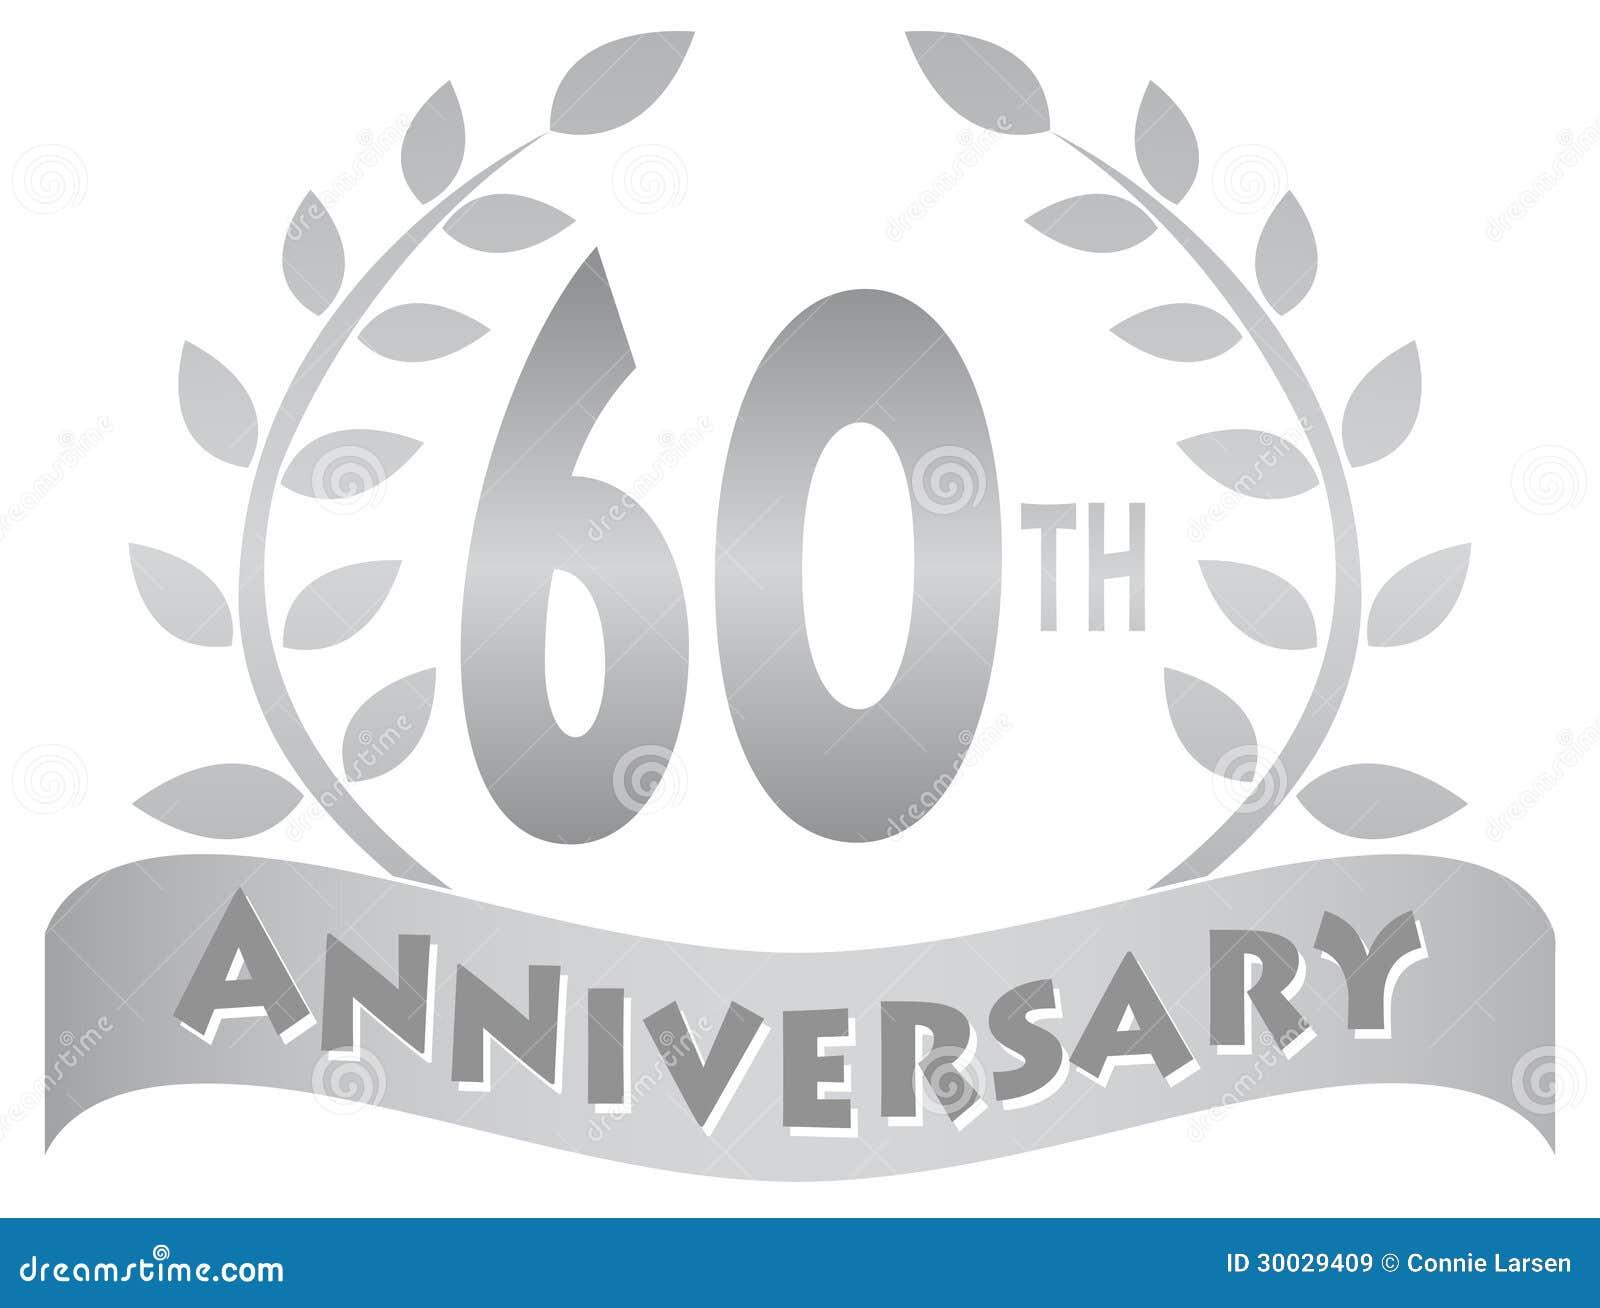 Sixtieth Anniversary Banner Eps Stock Vector